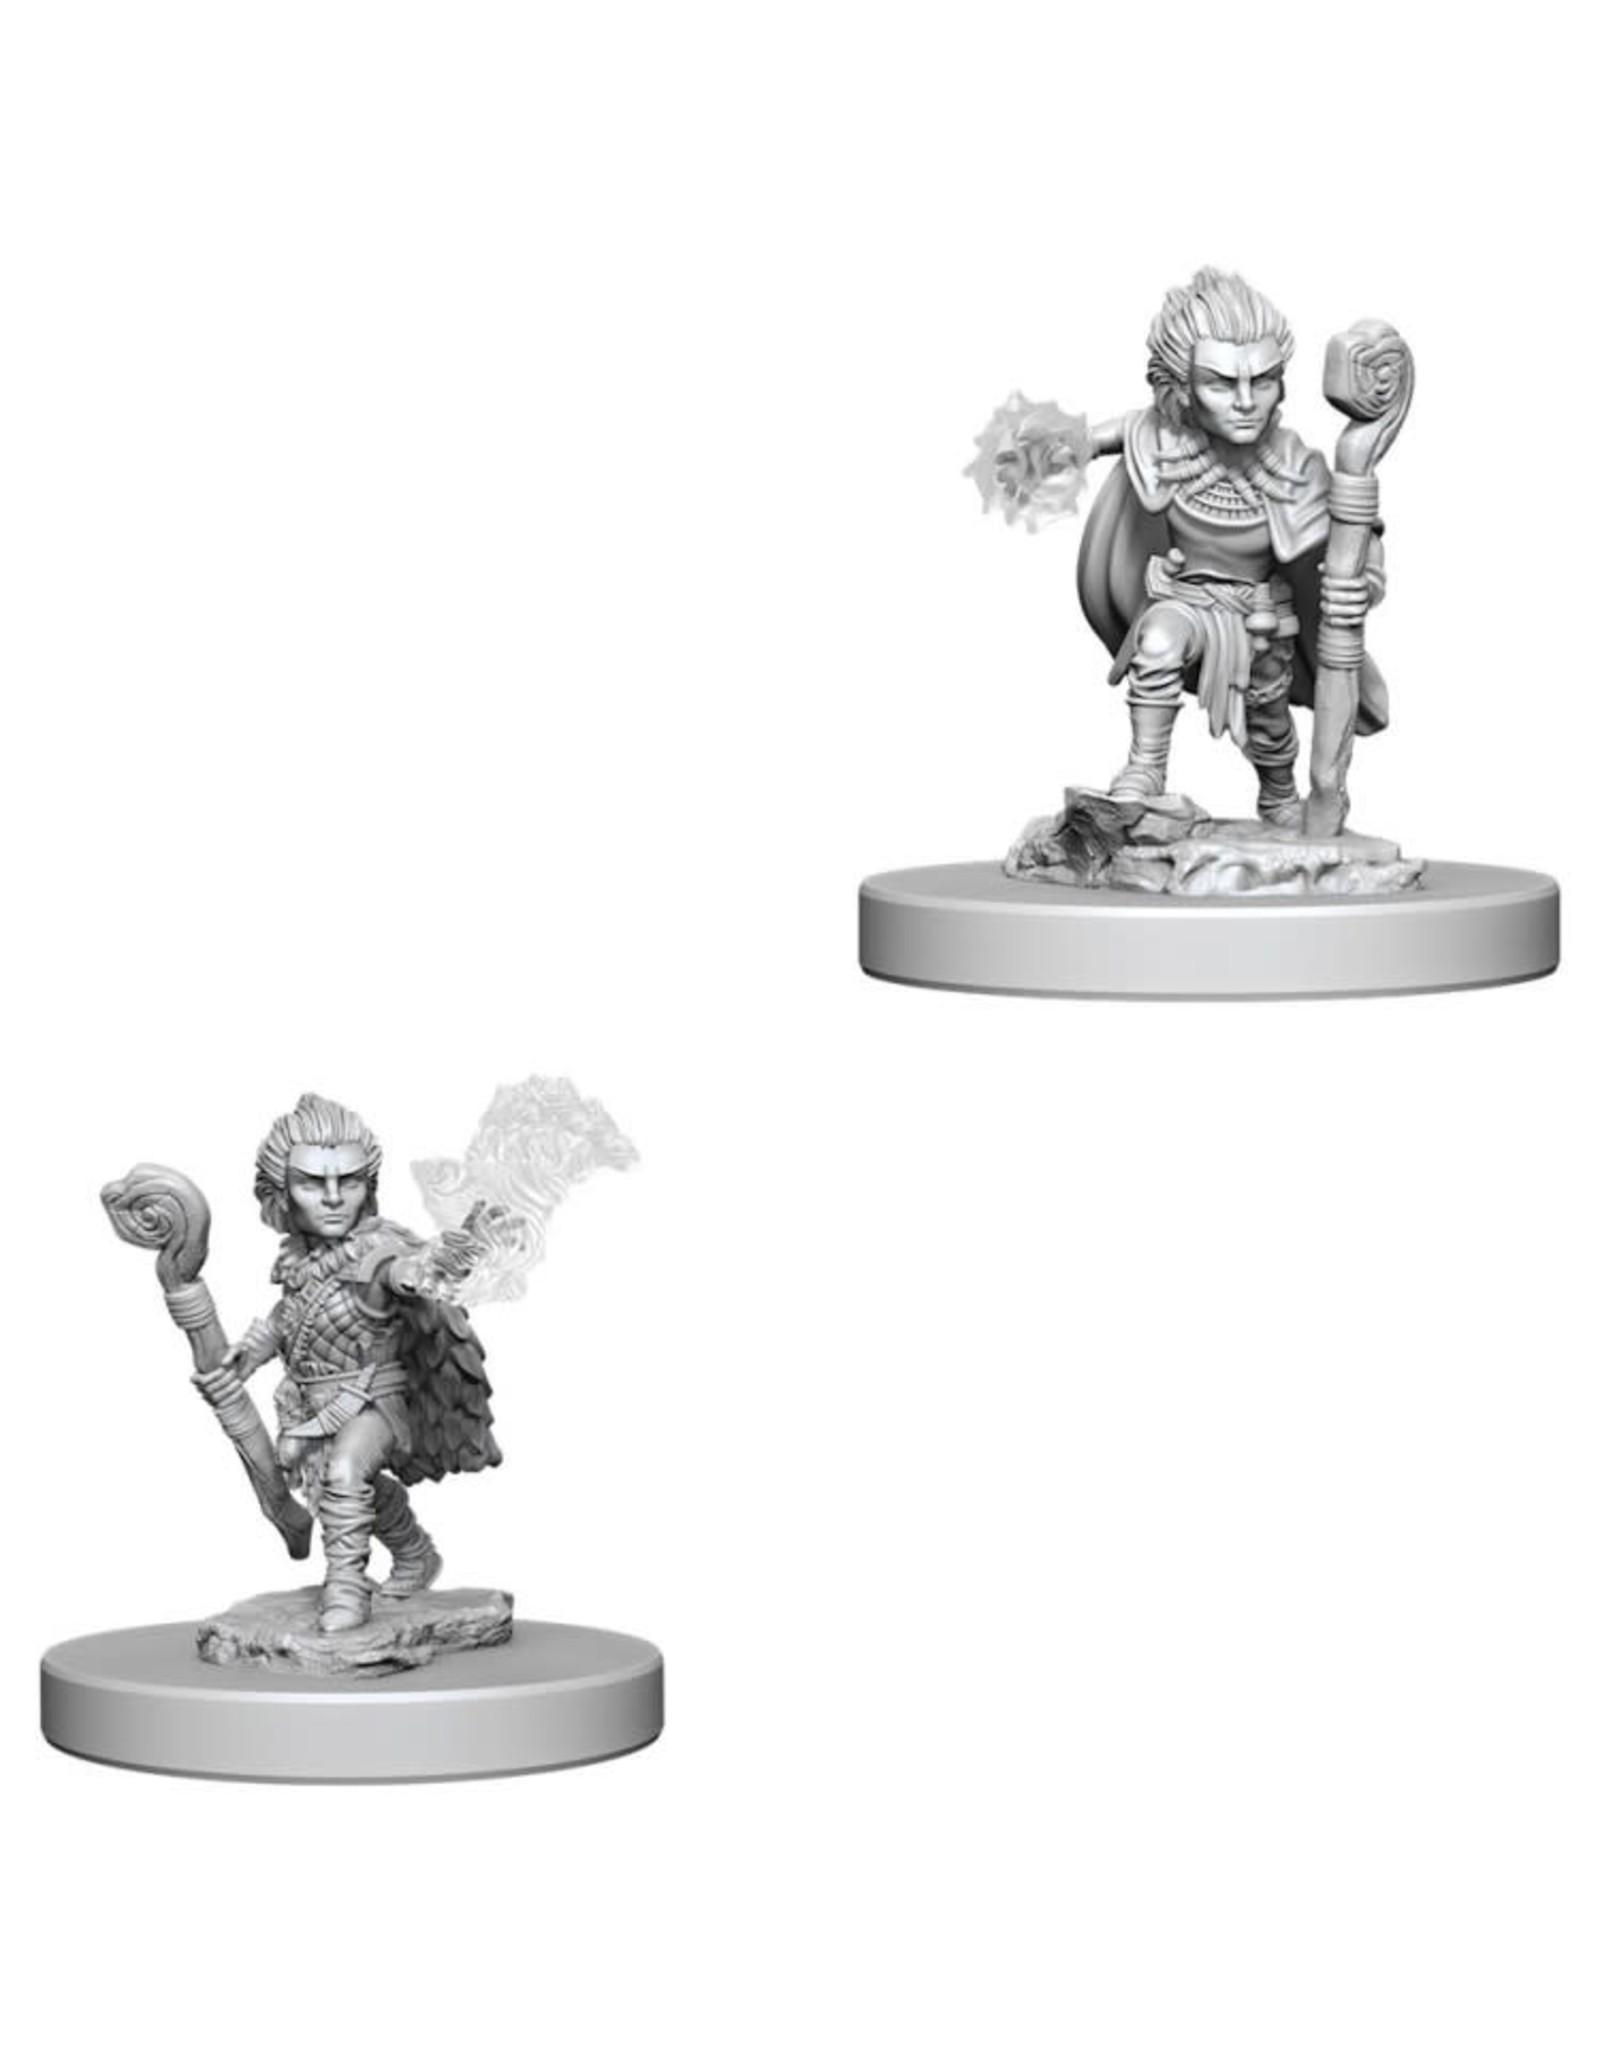 WizKids Pathfinder Minis (unpainted): Gnome Druid (male) Wave 5, 73346